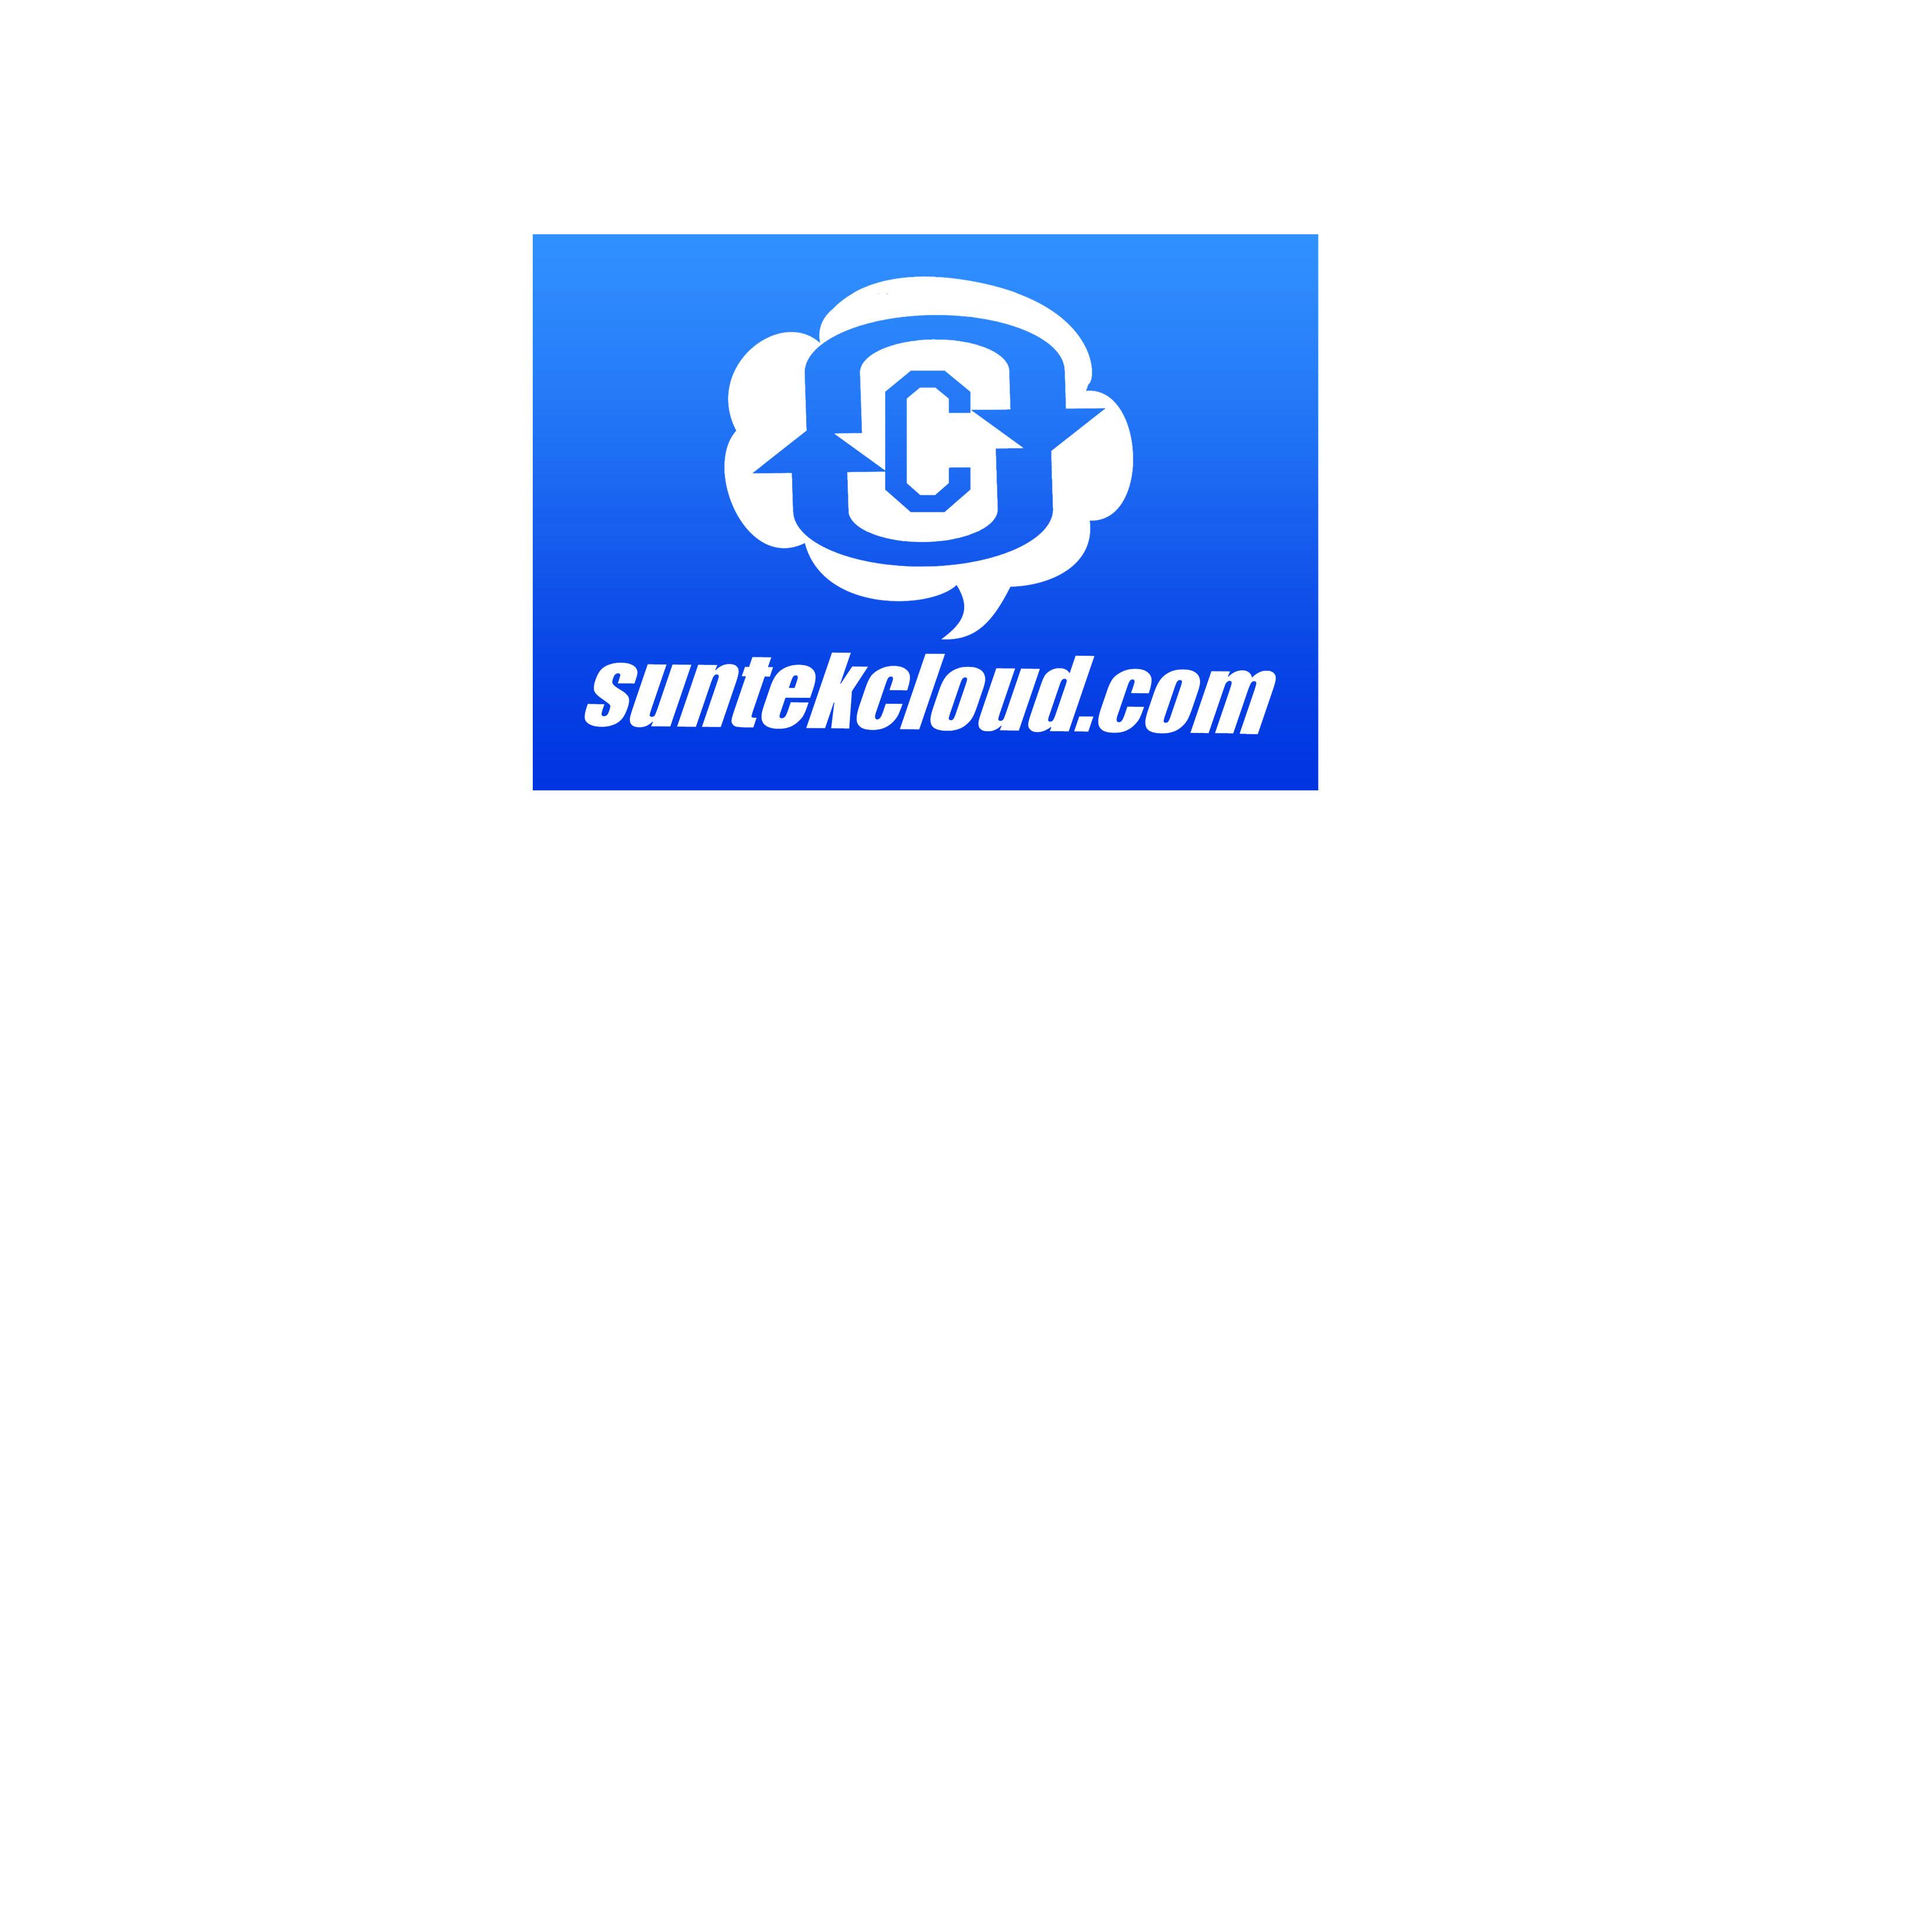 Logo Design by Alan Esclamado - Entry No. 5 in the Logo Design Contest Imaginative Logo Design for suntekcloud.com.